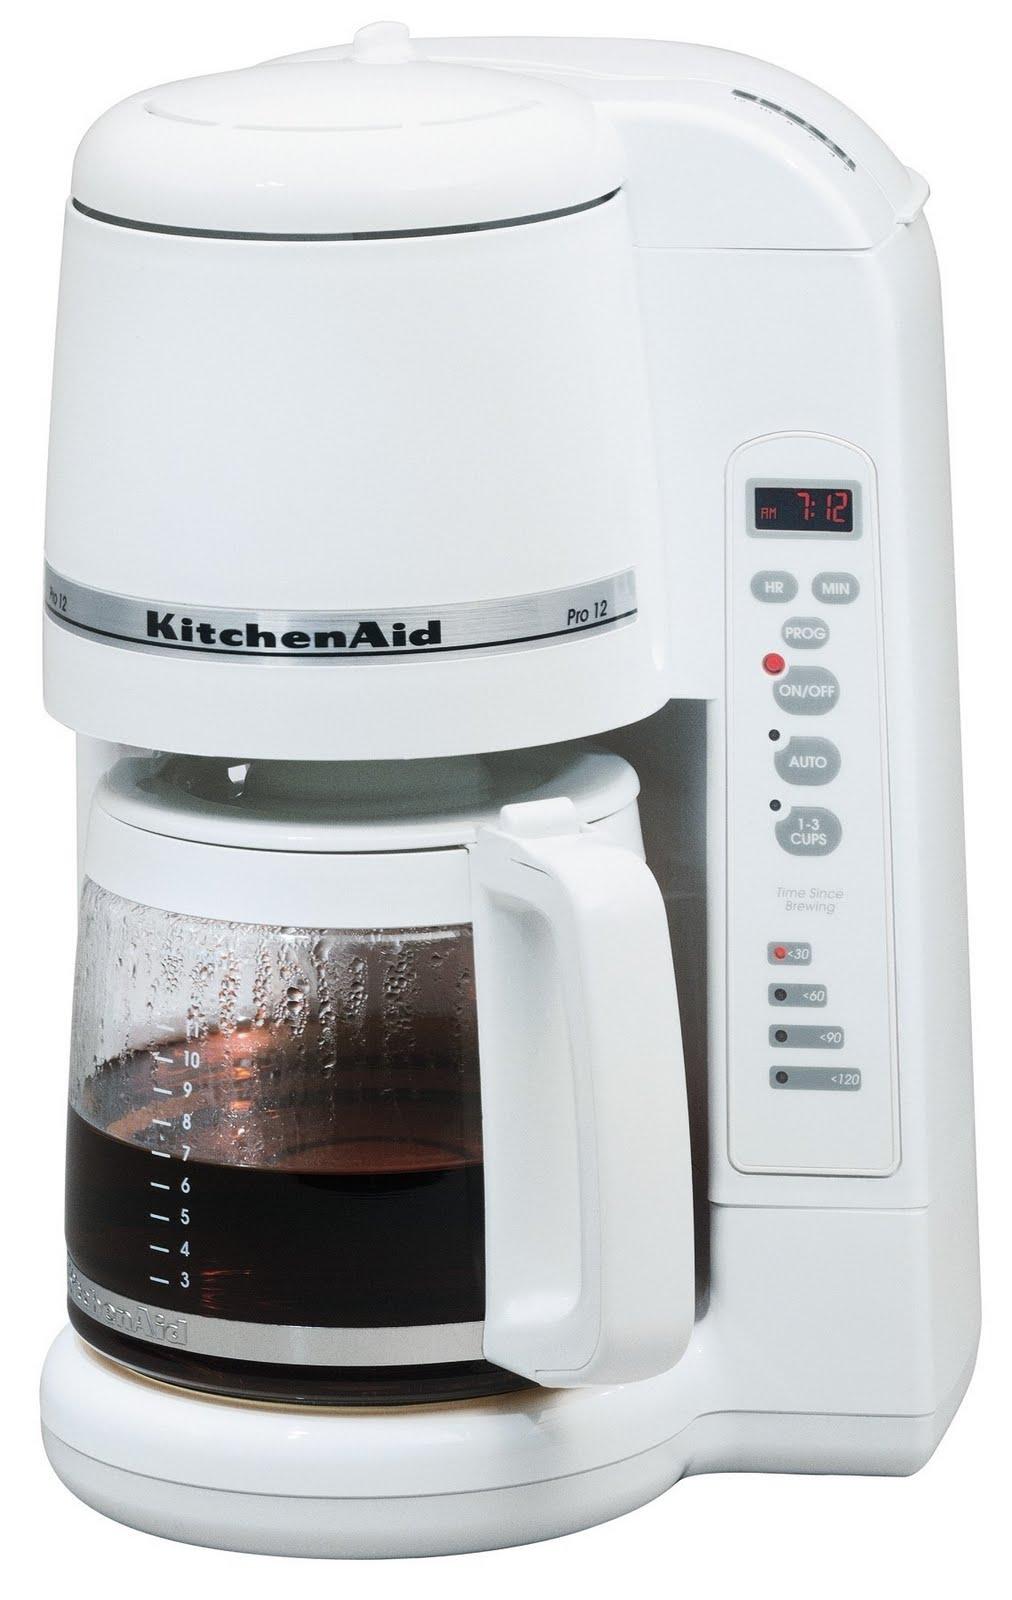 Coffee Maker Design Problem : Problems With Kitchenaid Coffee MakerMy Favorite Czech Recipes